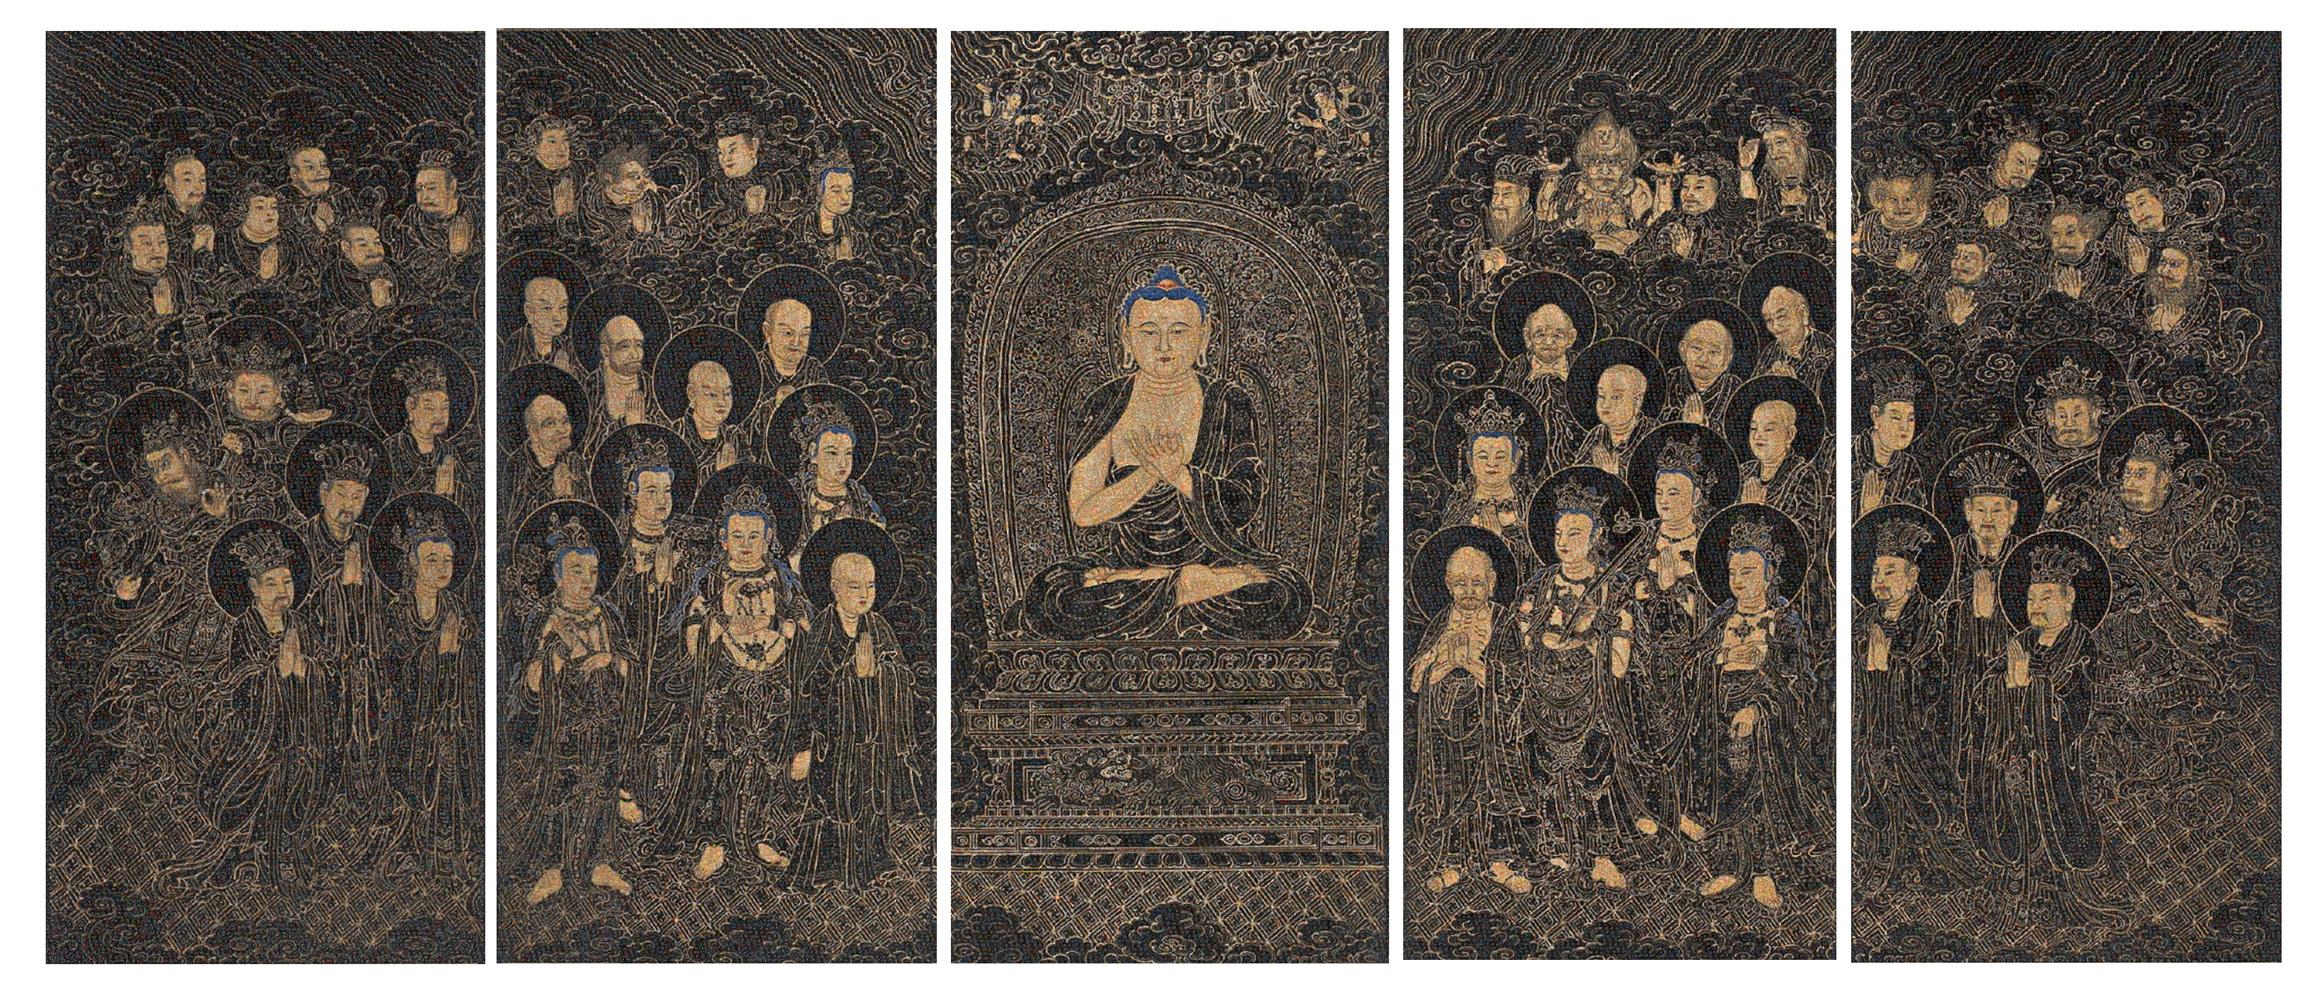 GUO JIAN  The Buddha No.1 2016 Inkjet pigment print (5 panels) 200 cm x 471 cm